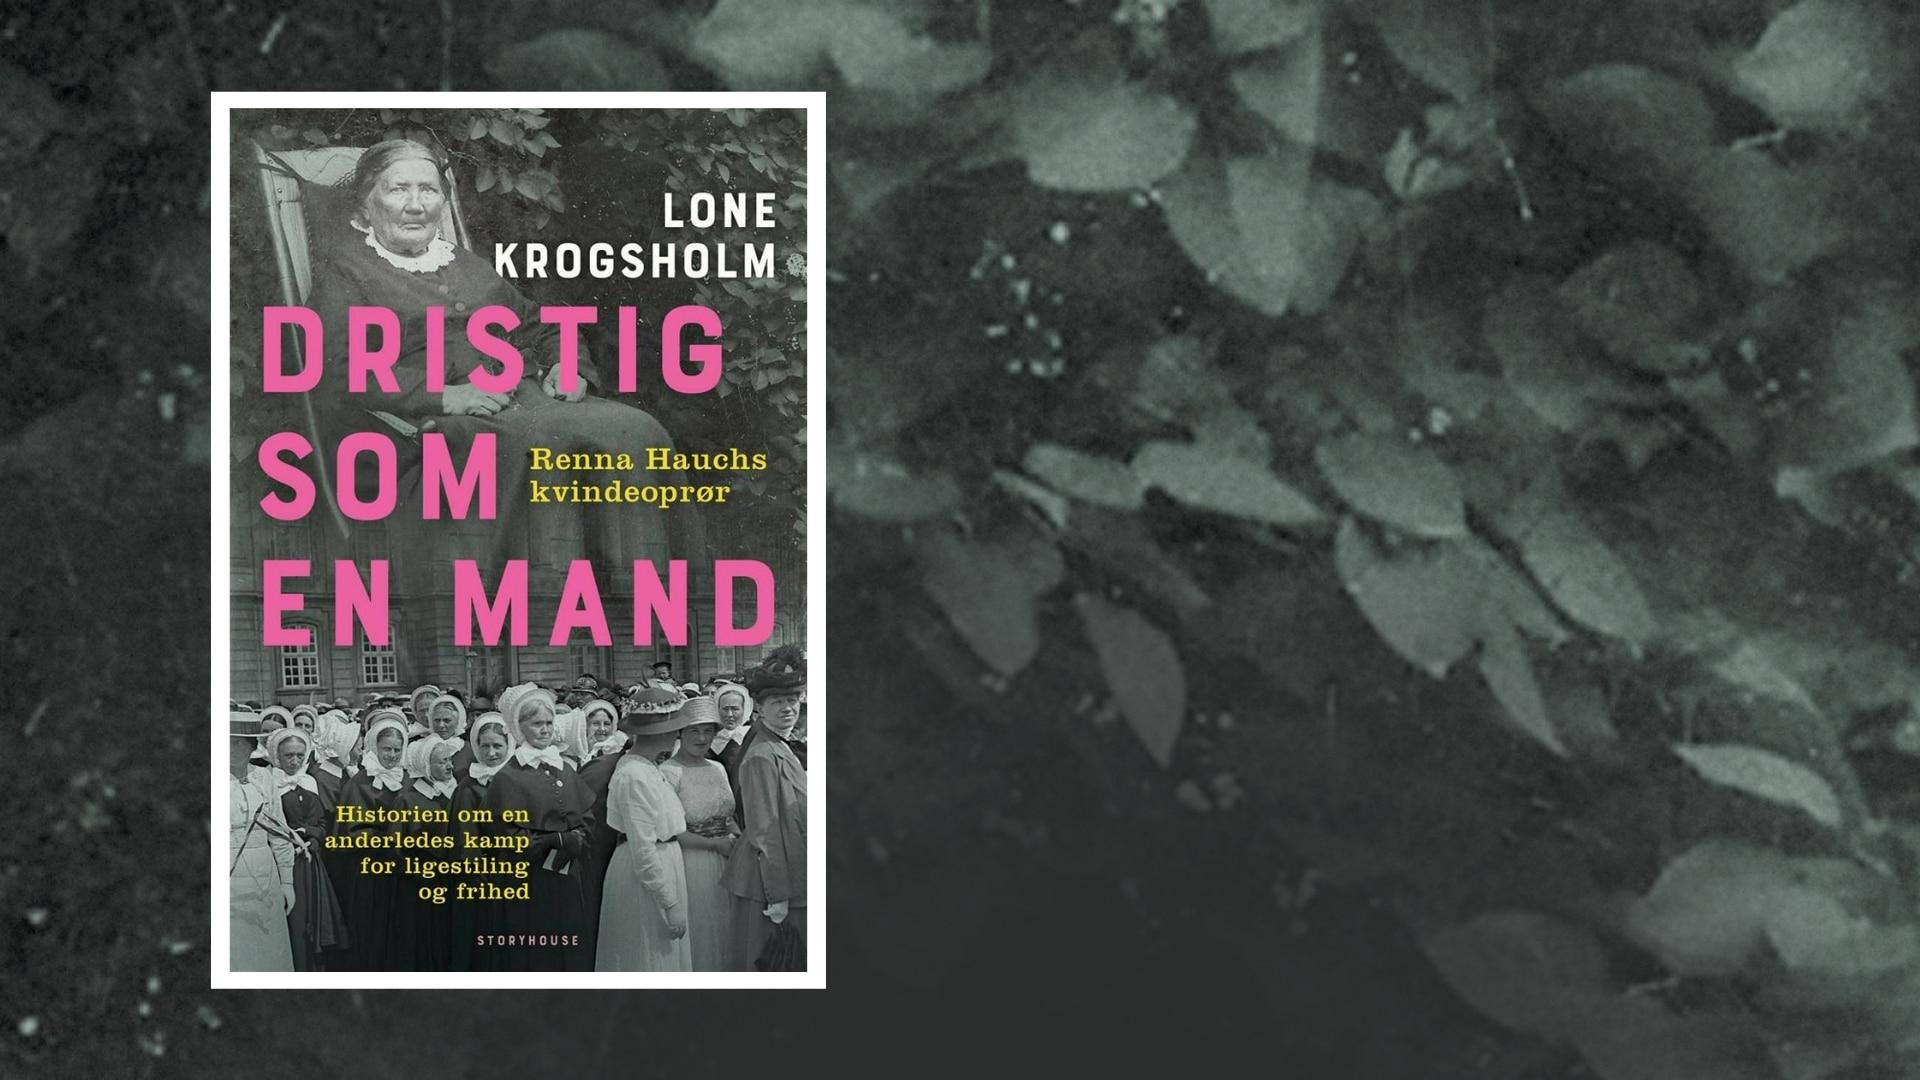 Dristig som en mand, Lone Krogsholm, Renna Hauch